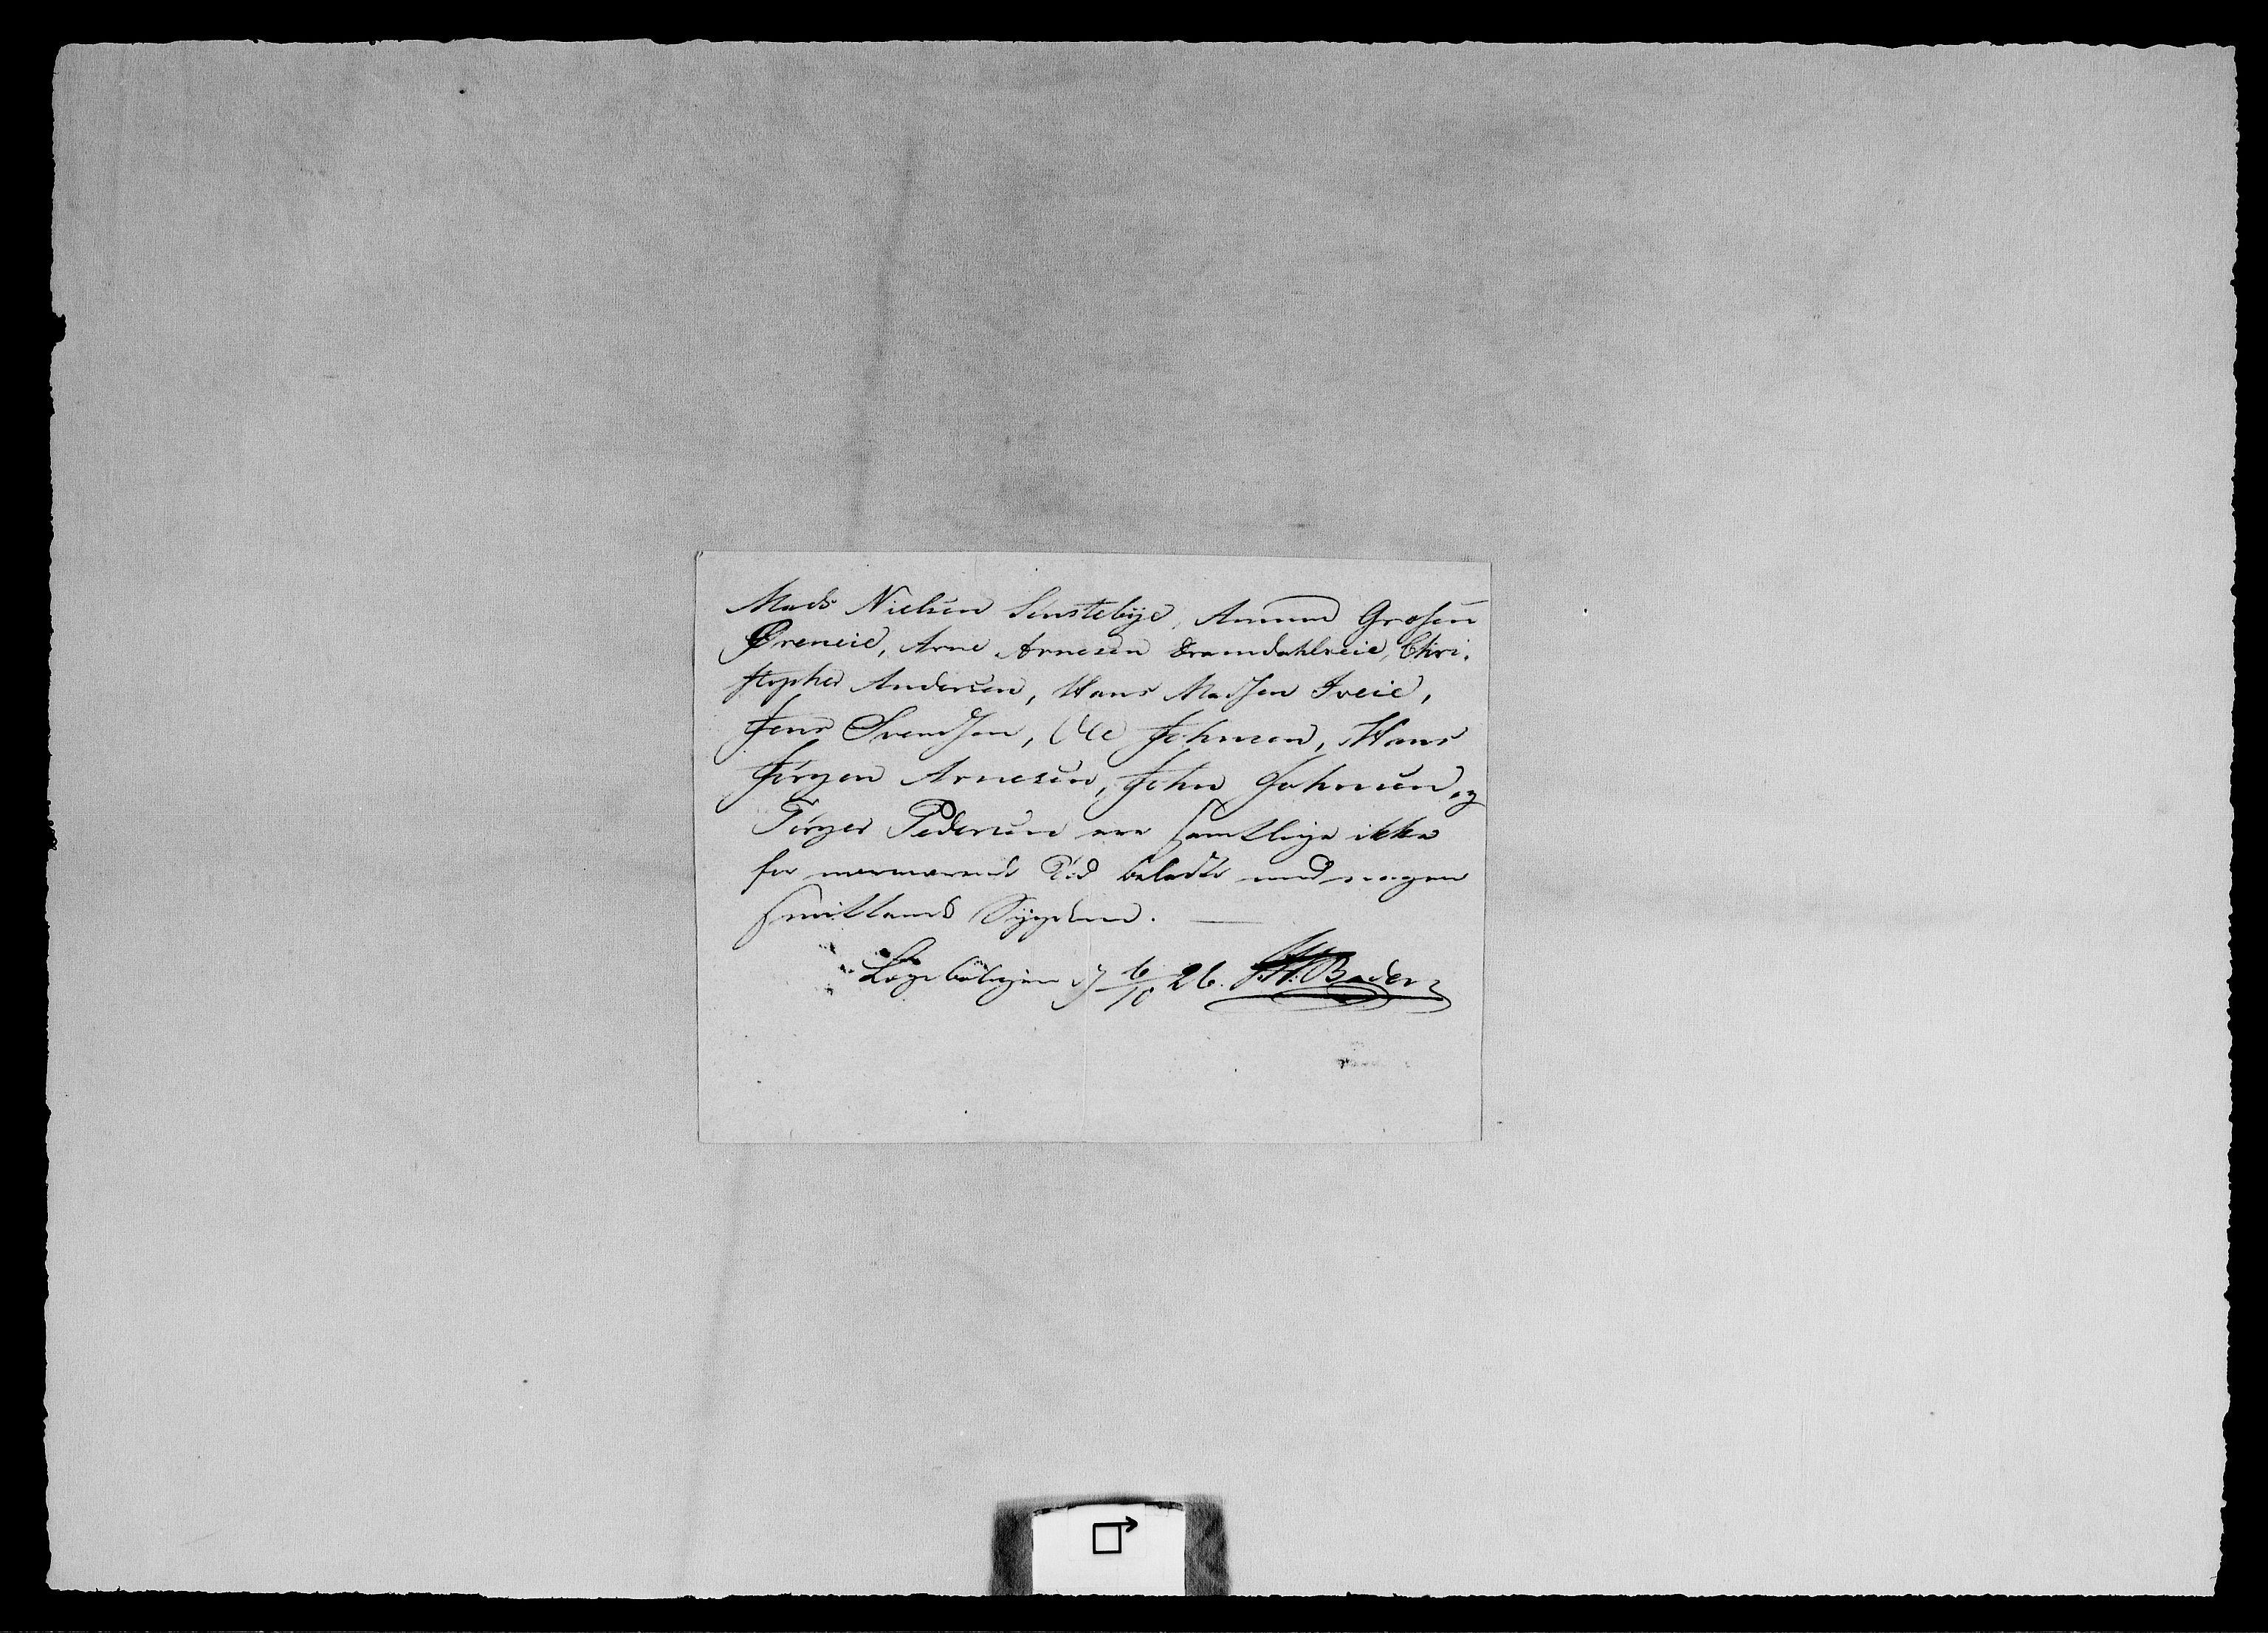 RA, Modums Blaafarveværk, G/Gh/L0379, 1828-1841, s. 2